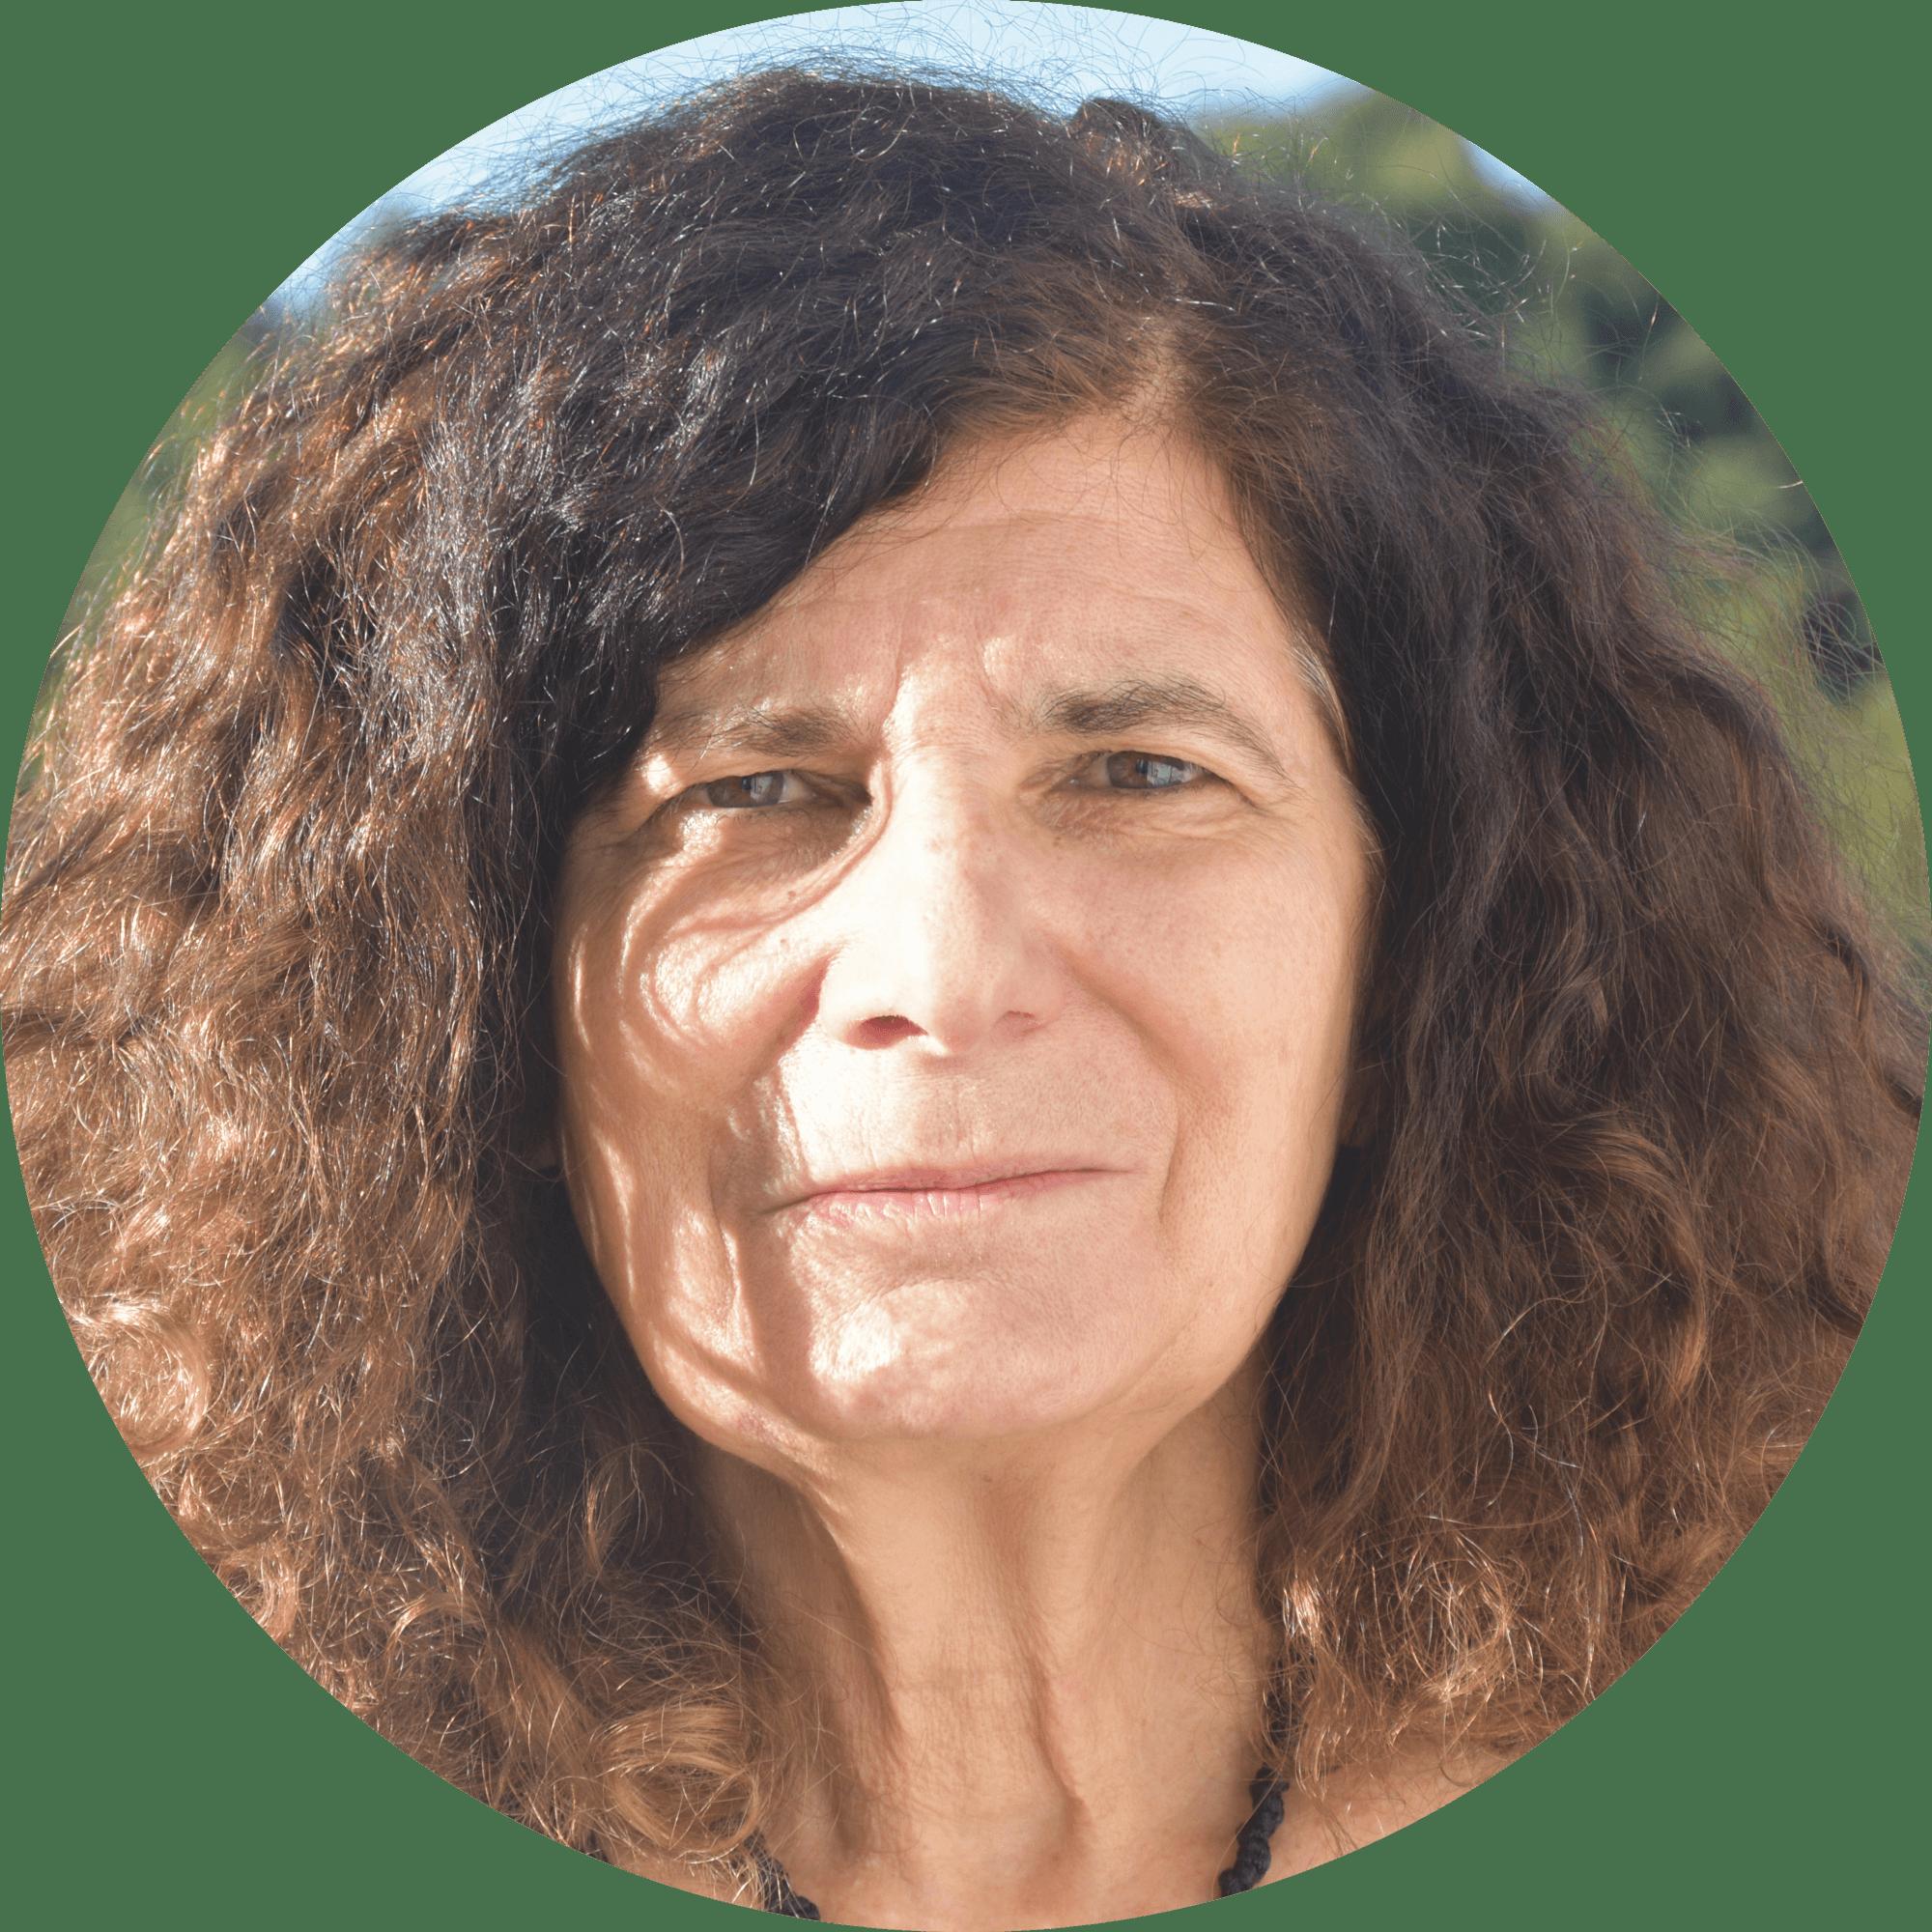 Annette Becker